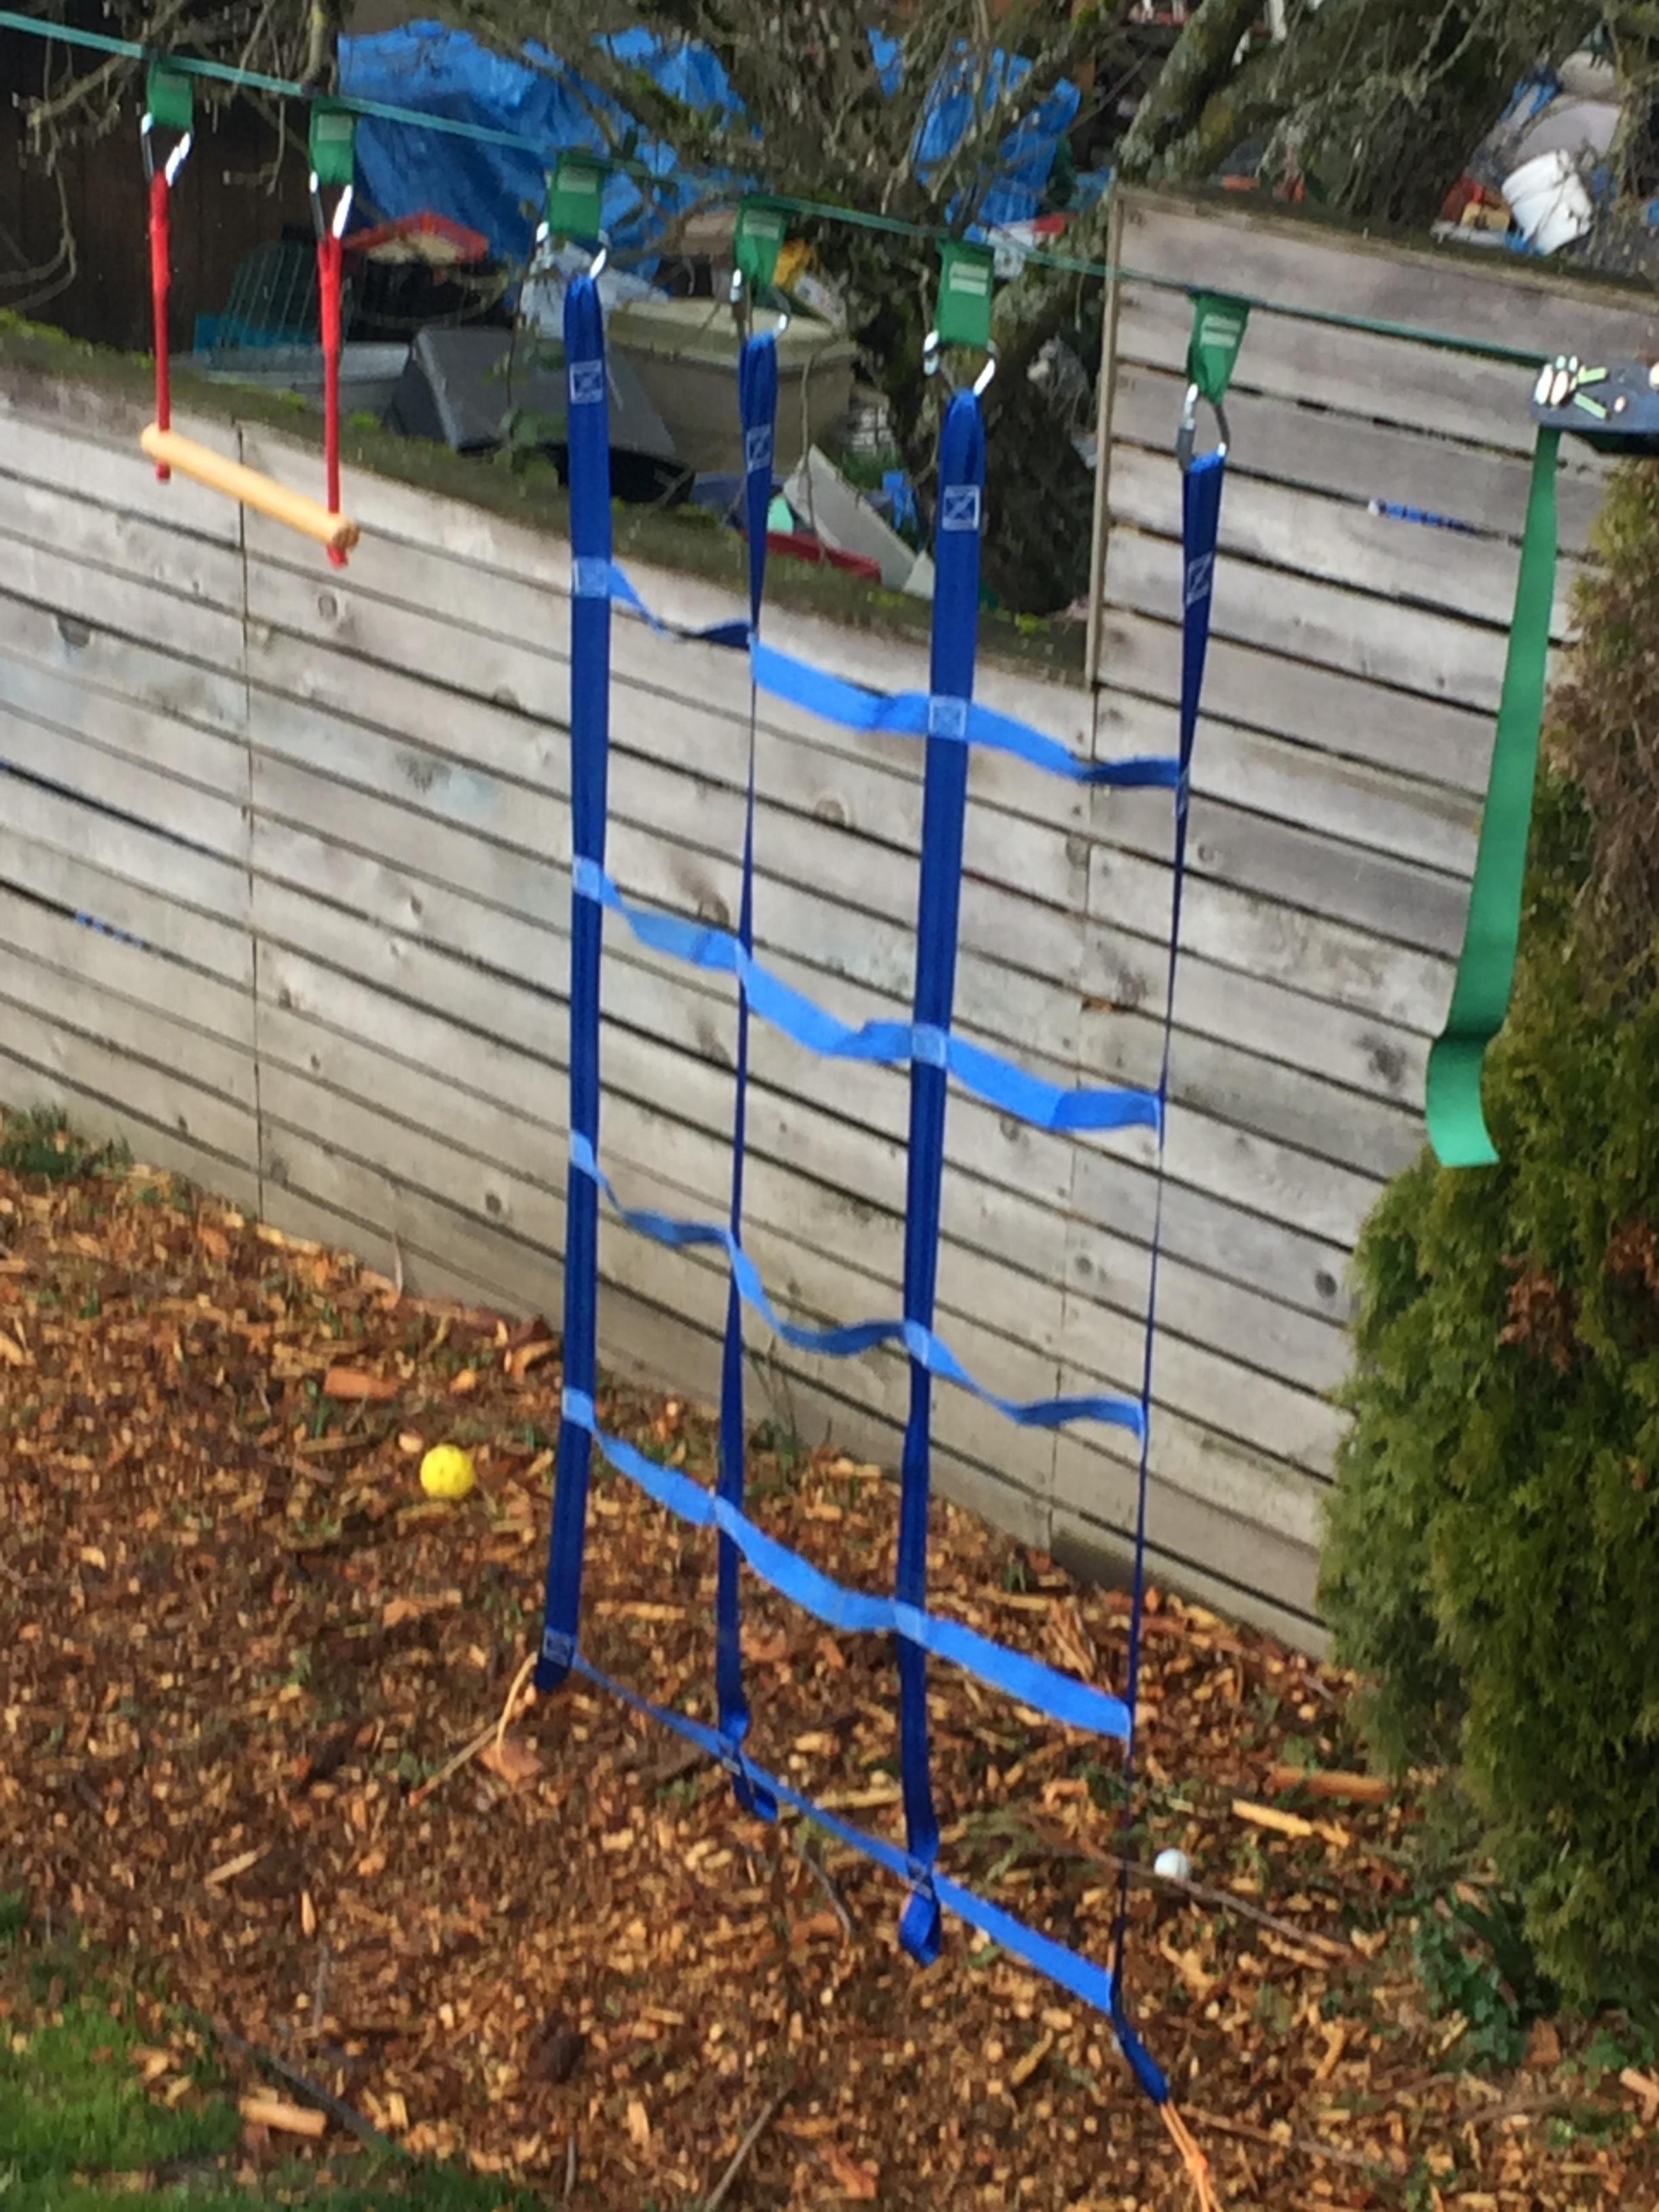 Branton Ninja Warrior Obstacle Course for kids set up along fence in backyard climbing net